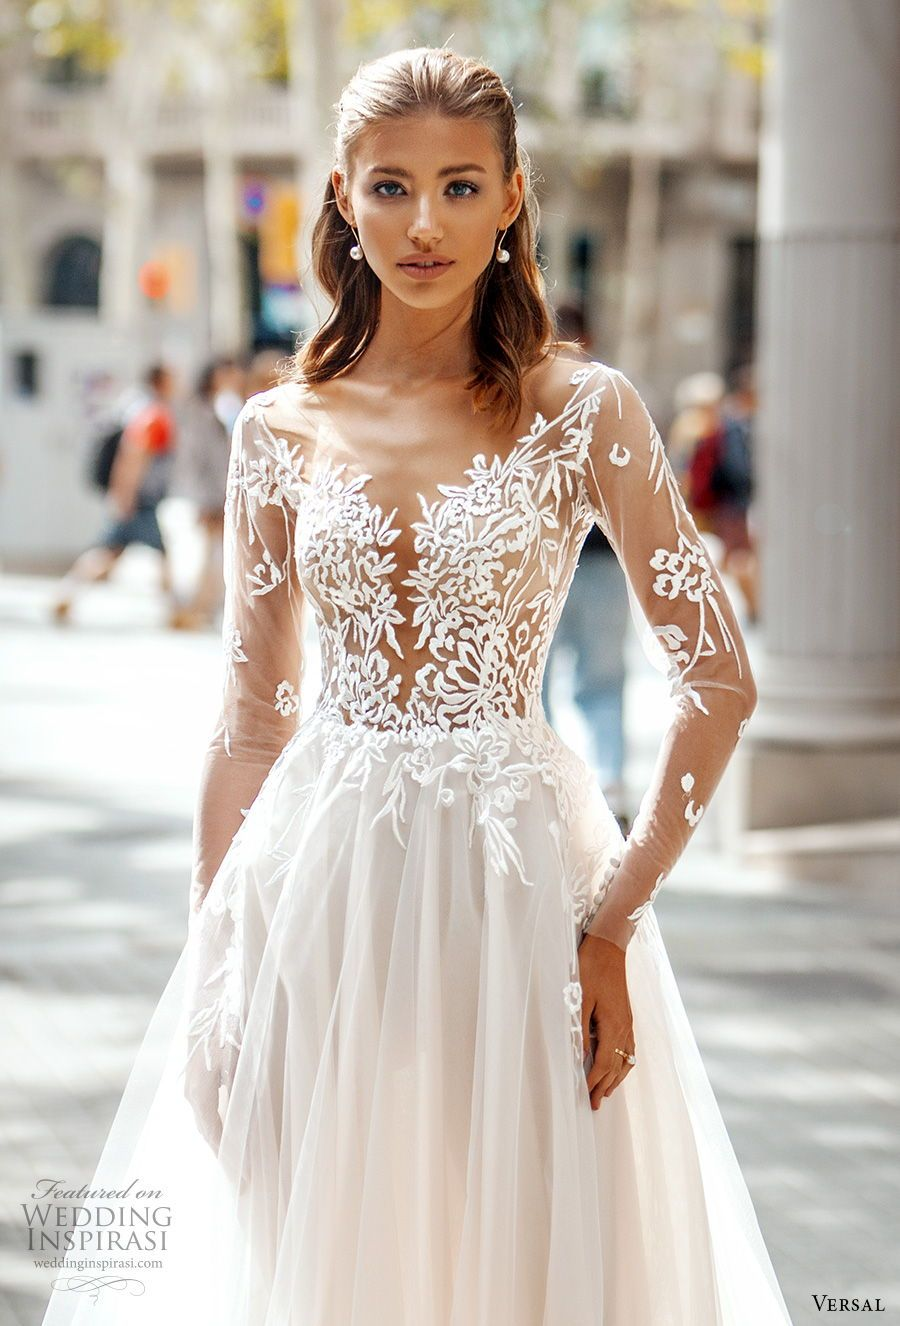 Versal Wedding Dress 2020 Bridal Collection Wedding Inspirasi White Wedding Gowns Sheer Wedding Dress Wedding Dress Styles [ 1326 x 900 Pixel ]